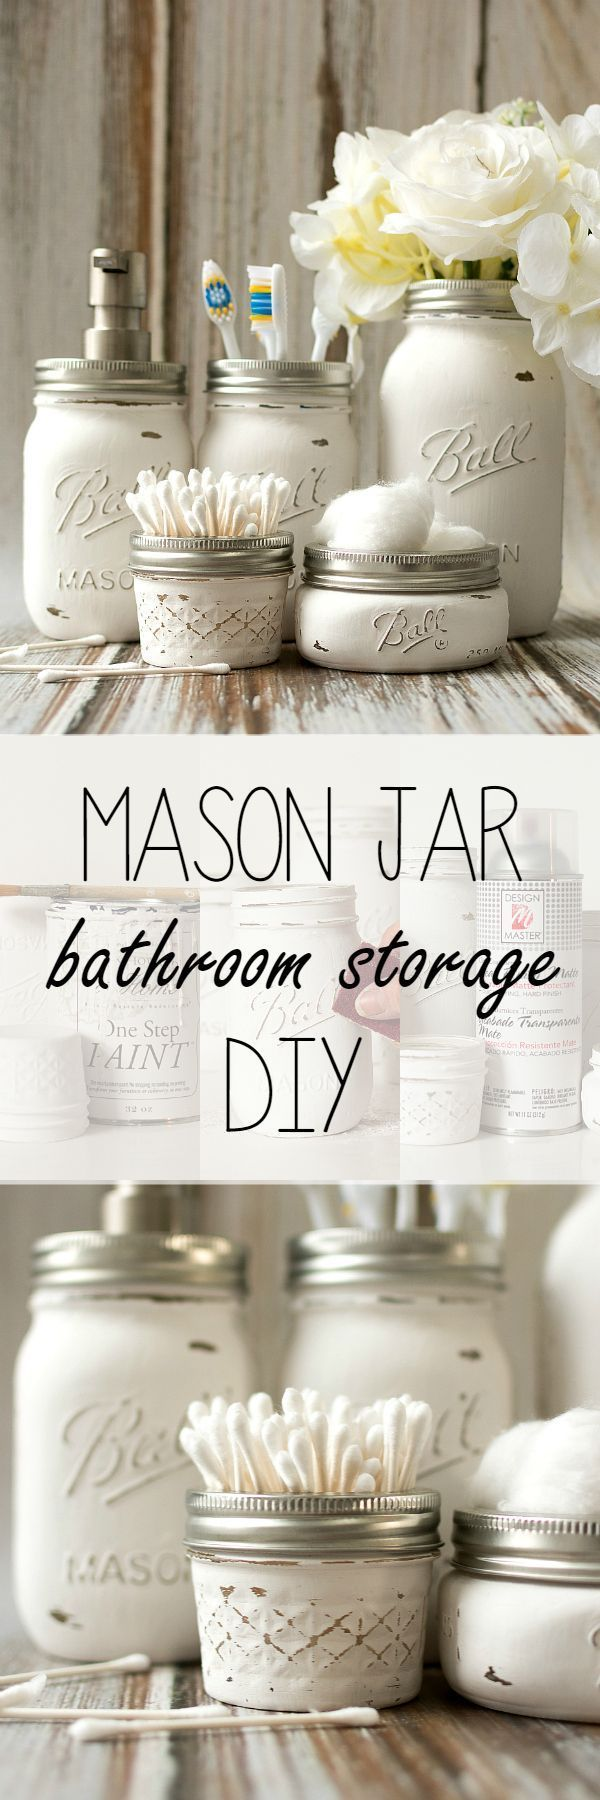 Mason Jar Bathroom Storage & Accessories | DIY / Crafts for Grown ...